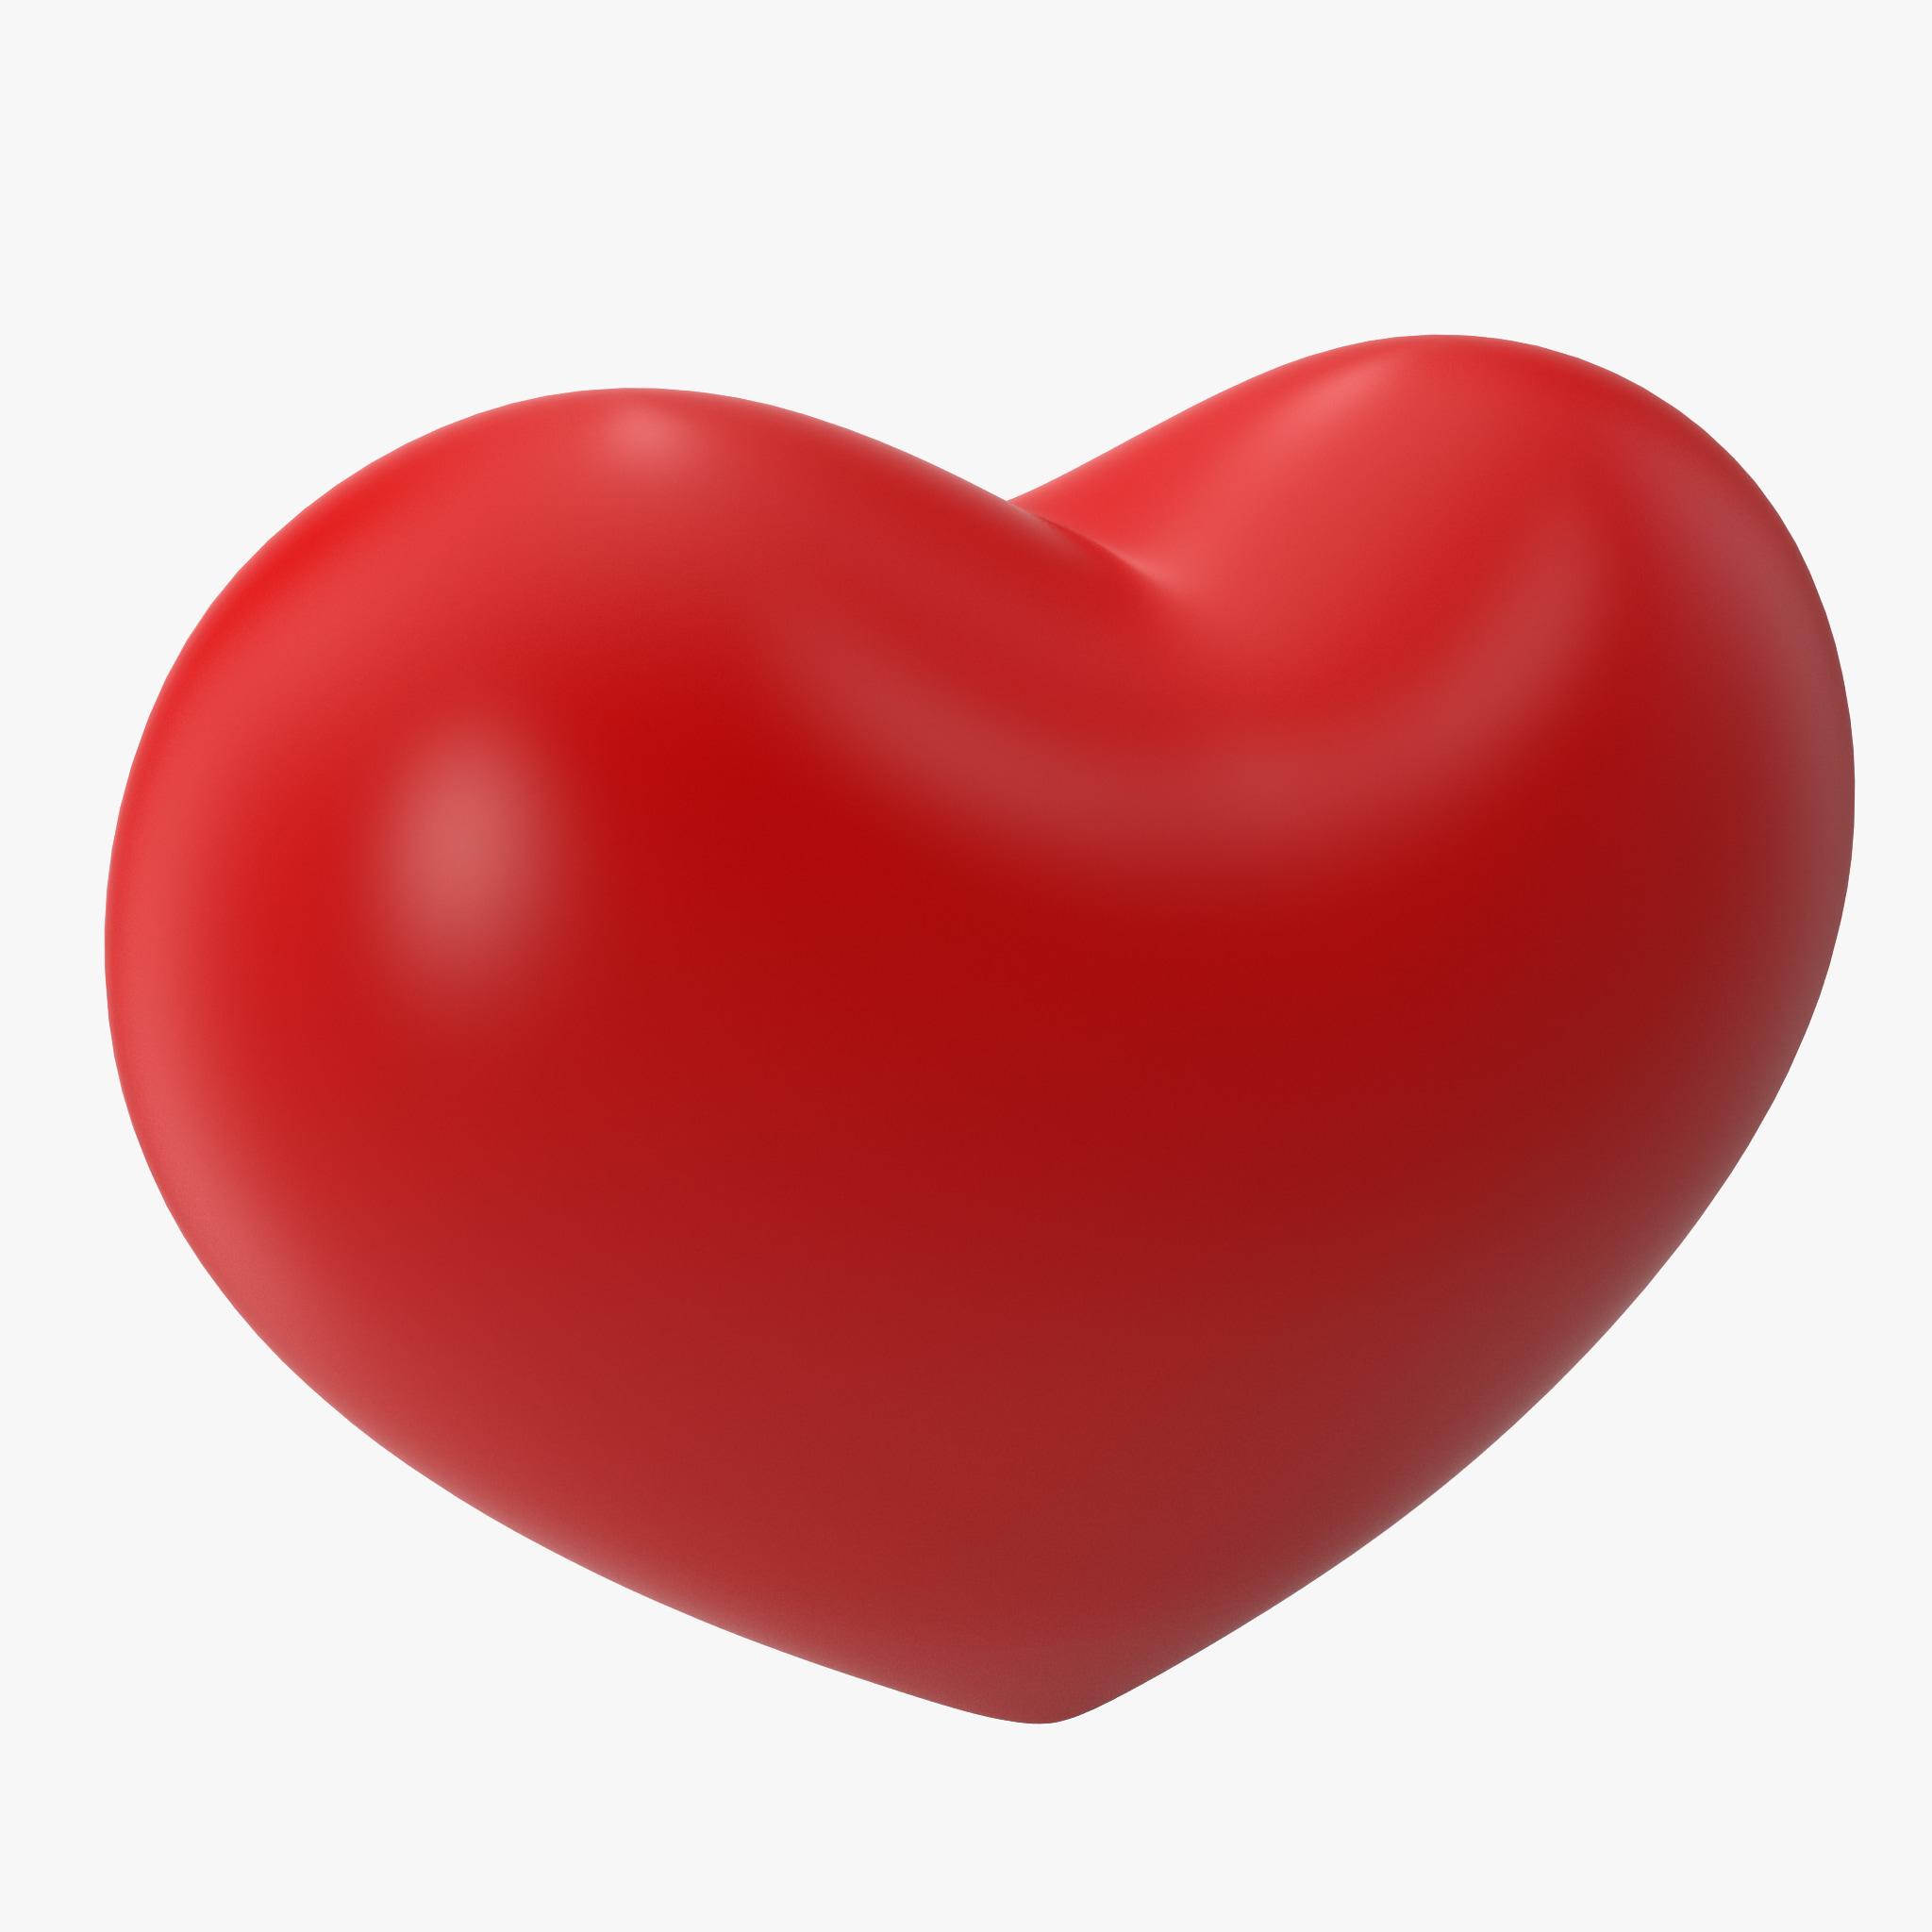 Heart Shape_1.jpg